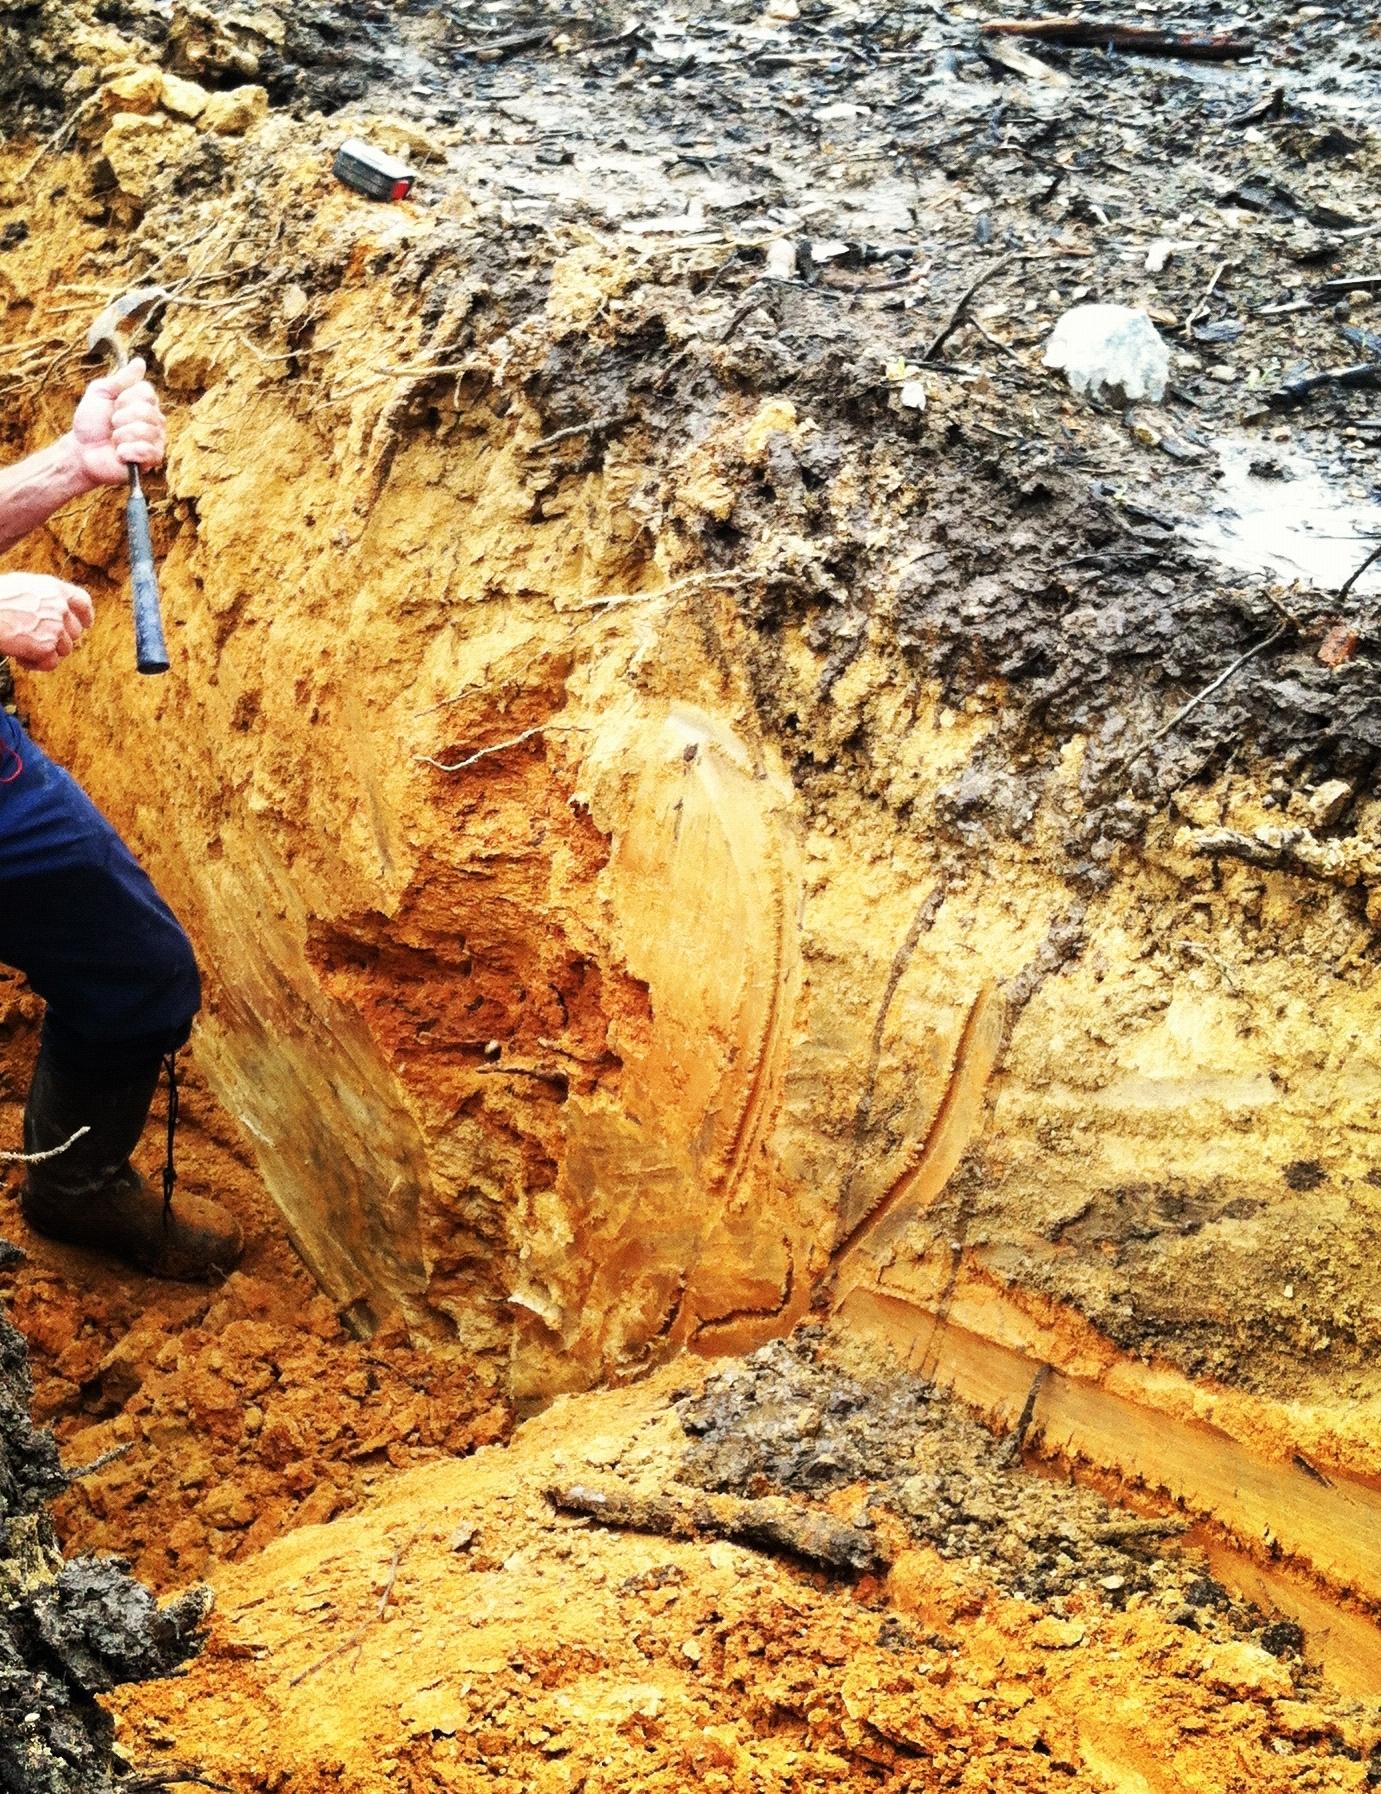 Clonal, Trellis, and Soil Studies